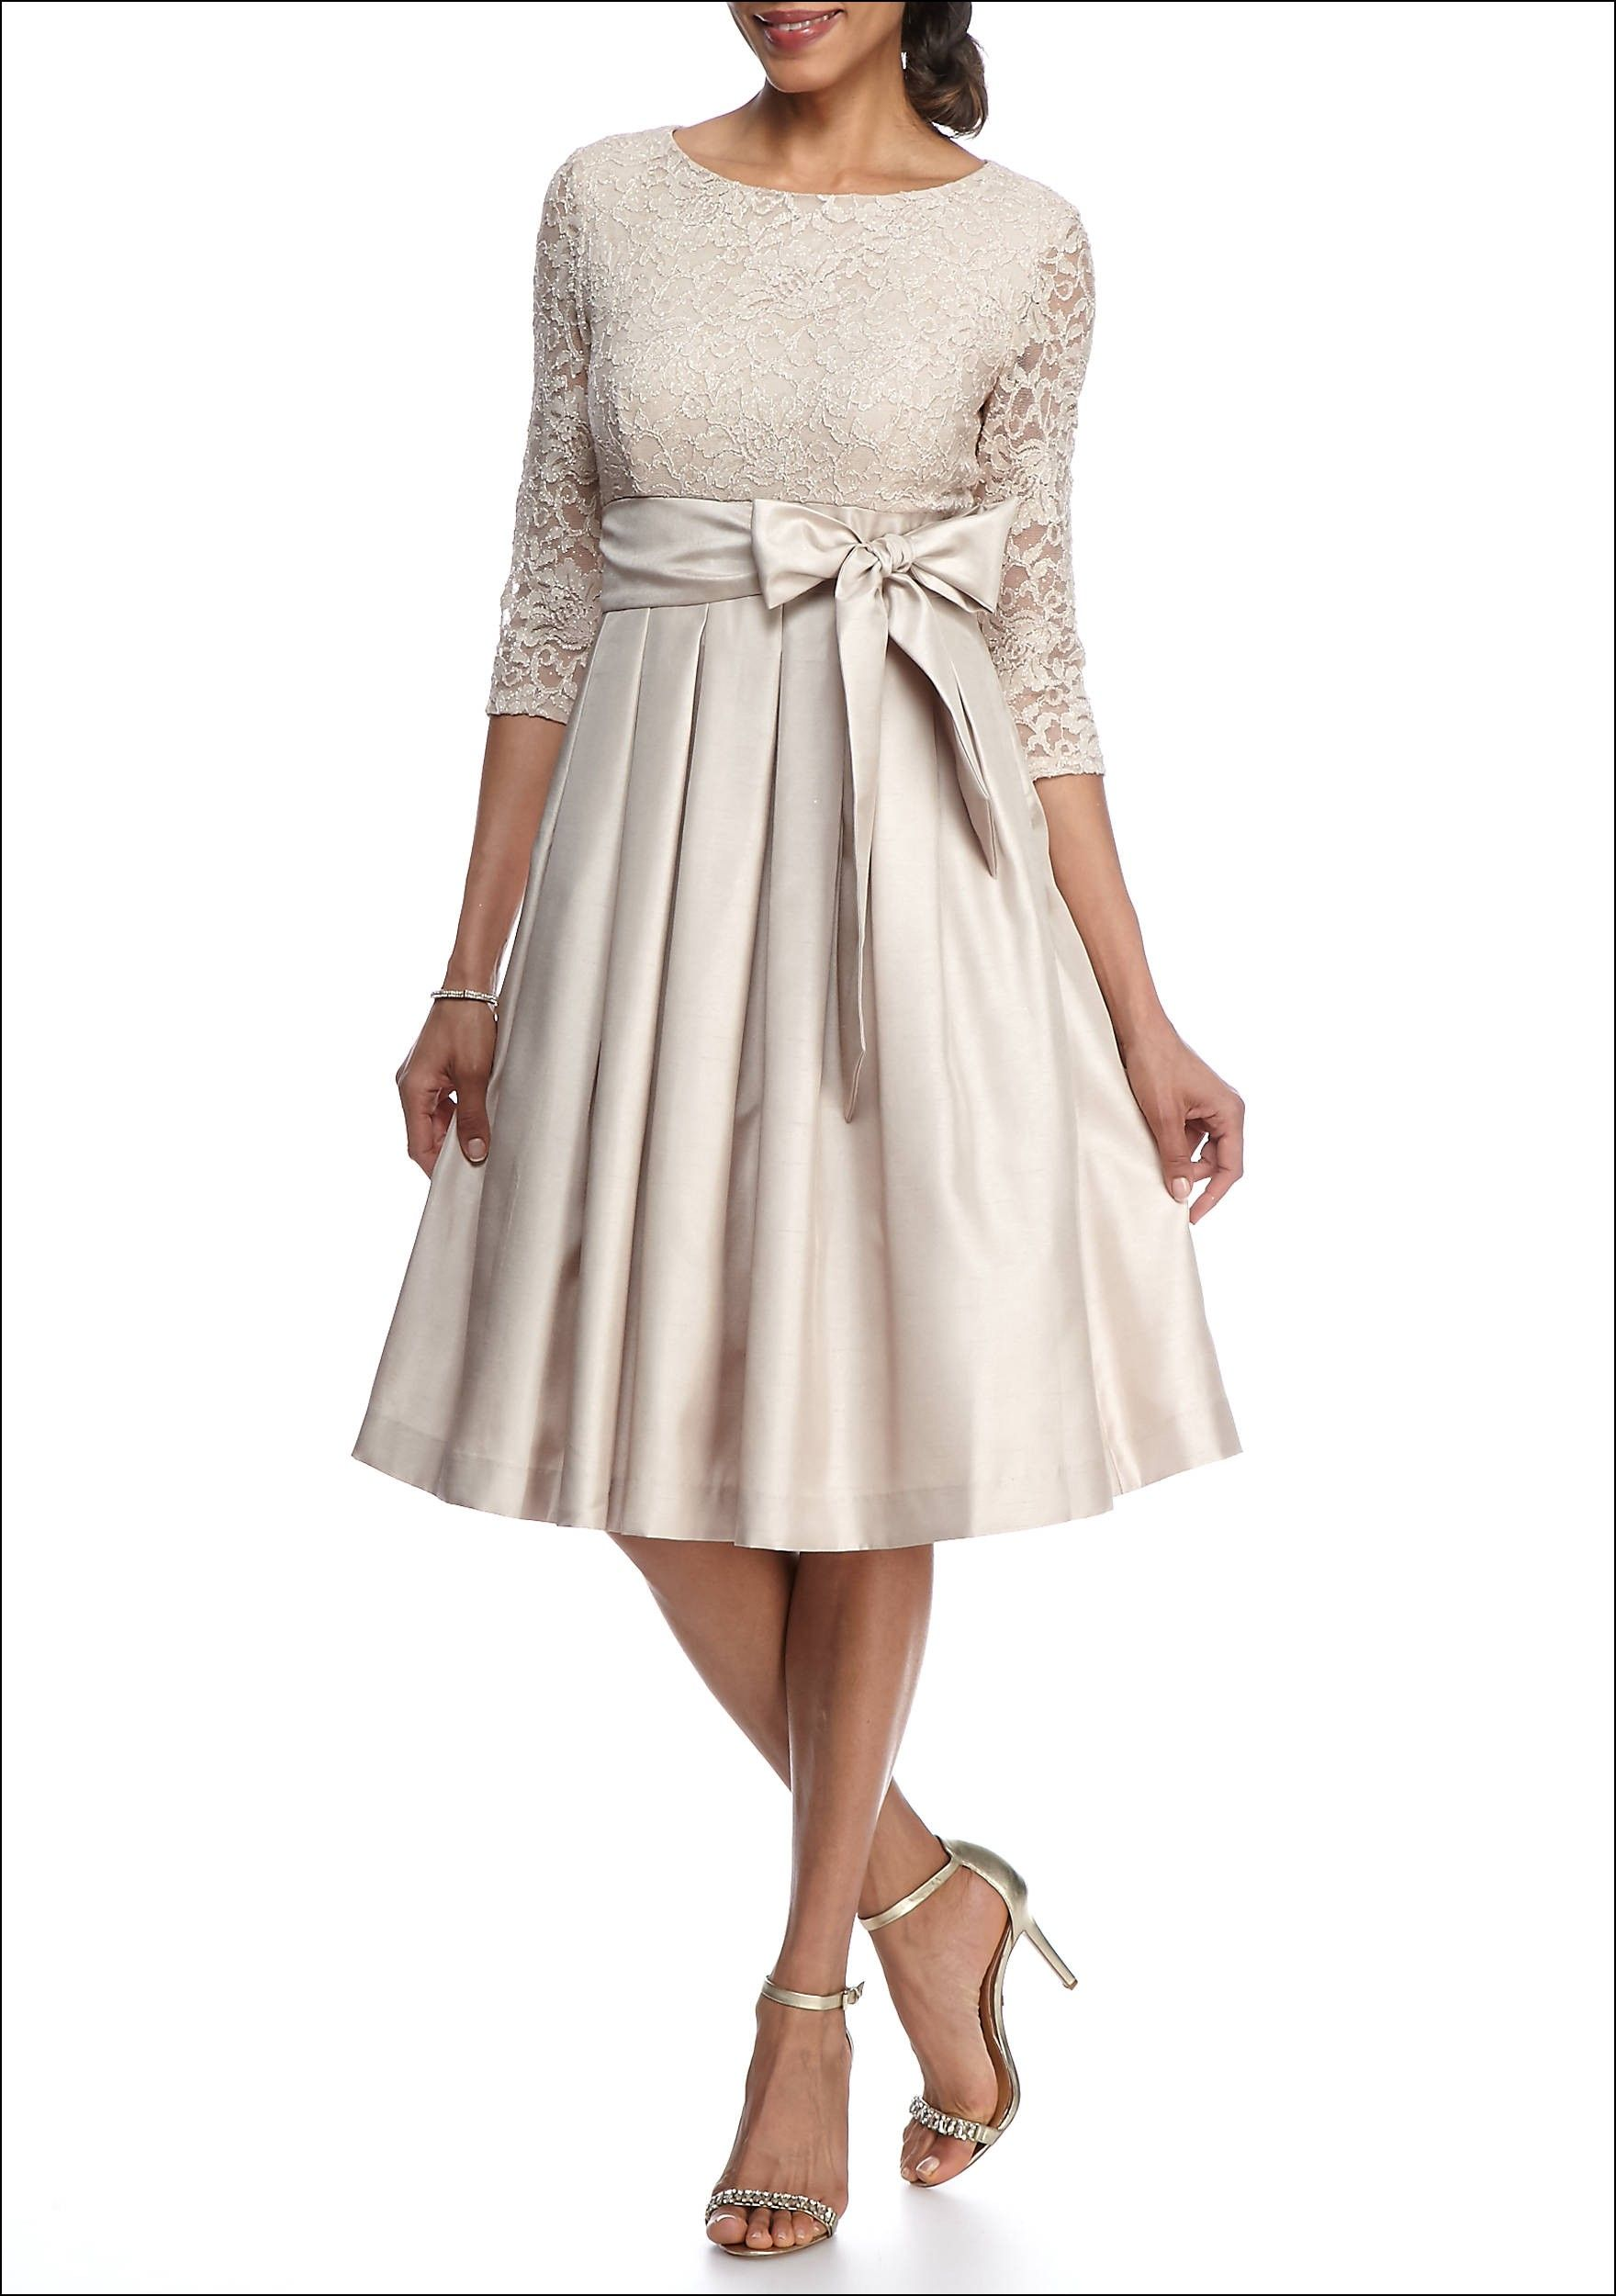 Belk Wedding Party Dresses   実写   Pinterest   Wedding party dresses